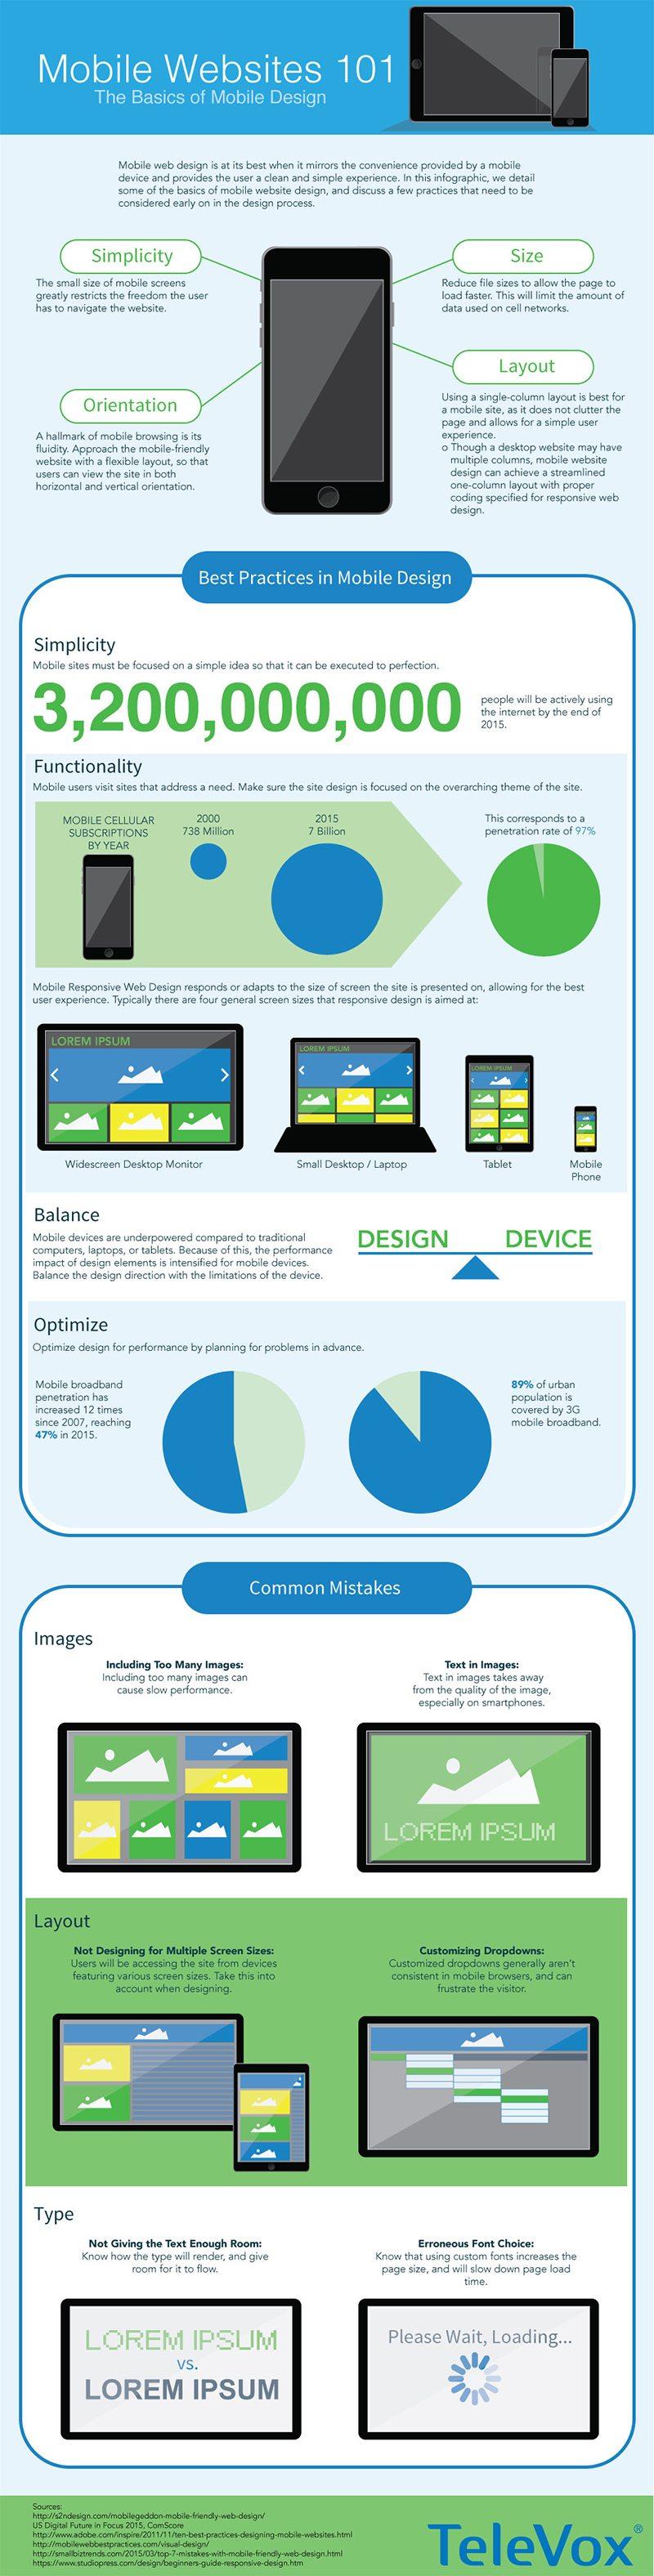 Mobile Website Development : Mobile website design common mistakes you must avoid